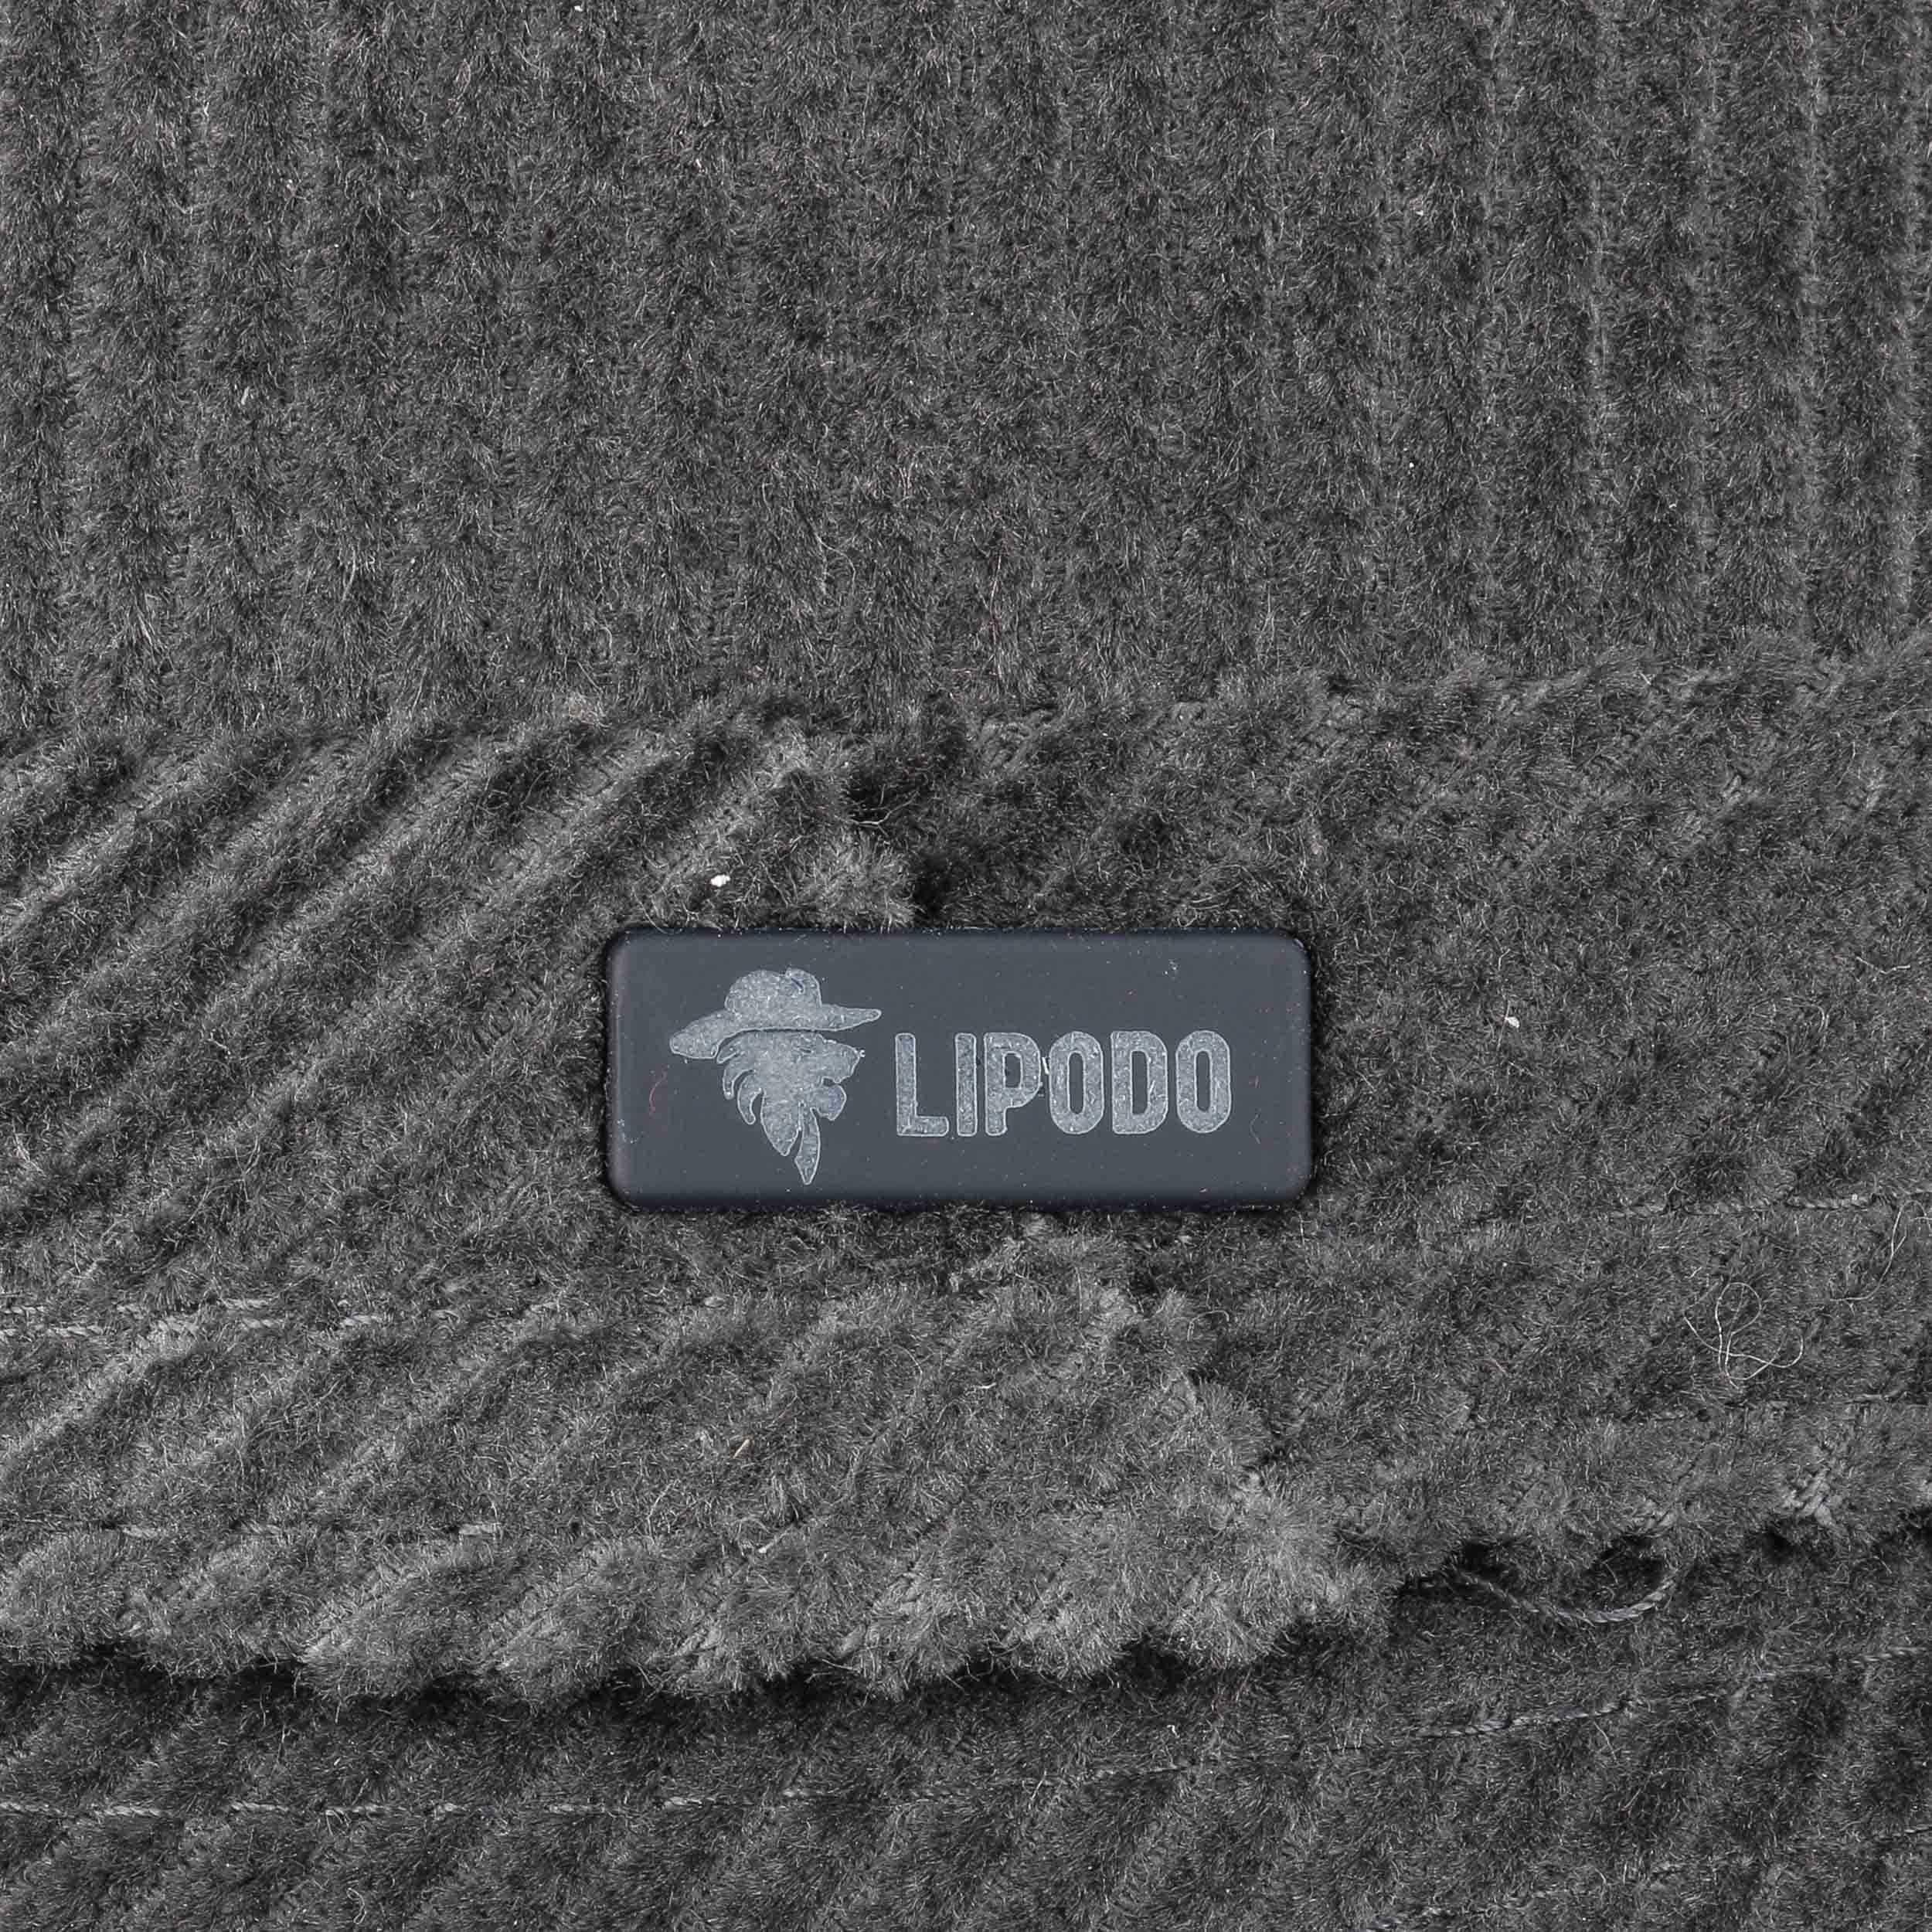 837bac9ac08 ... Molinar Corduroy Hat by Lipodo - olive 3 ...